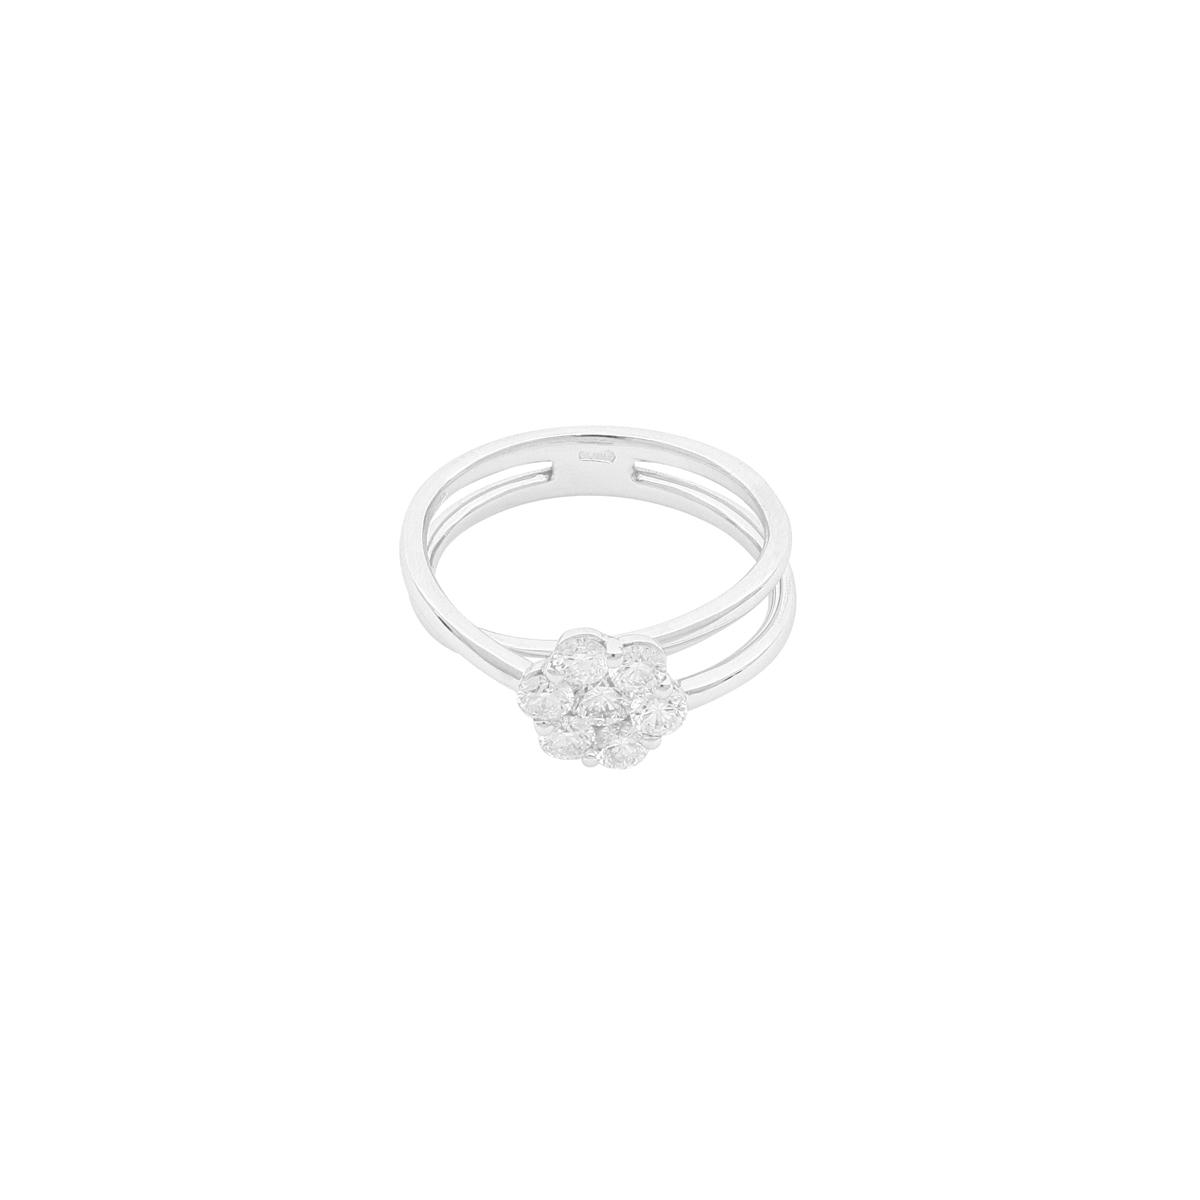 Magic Collection - 0.95 ct Diamond Flower Split Shank Ring in 18 Kt White Gold